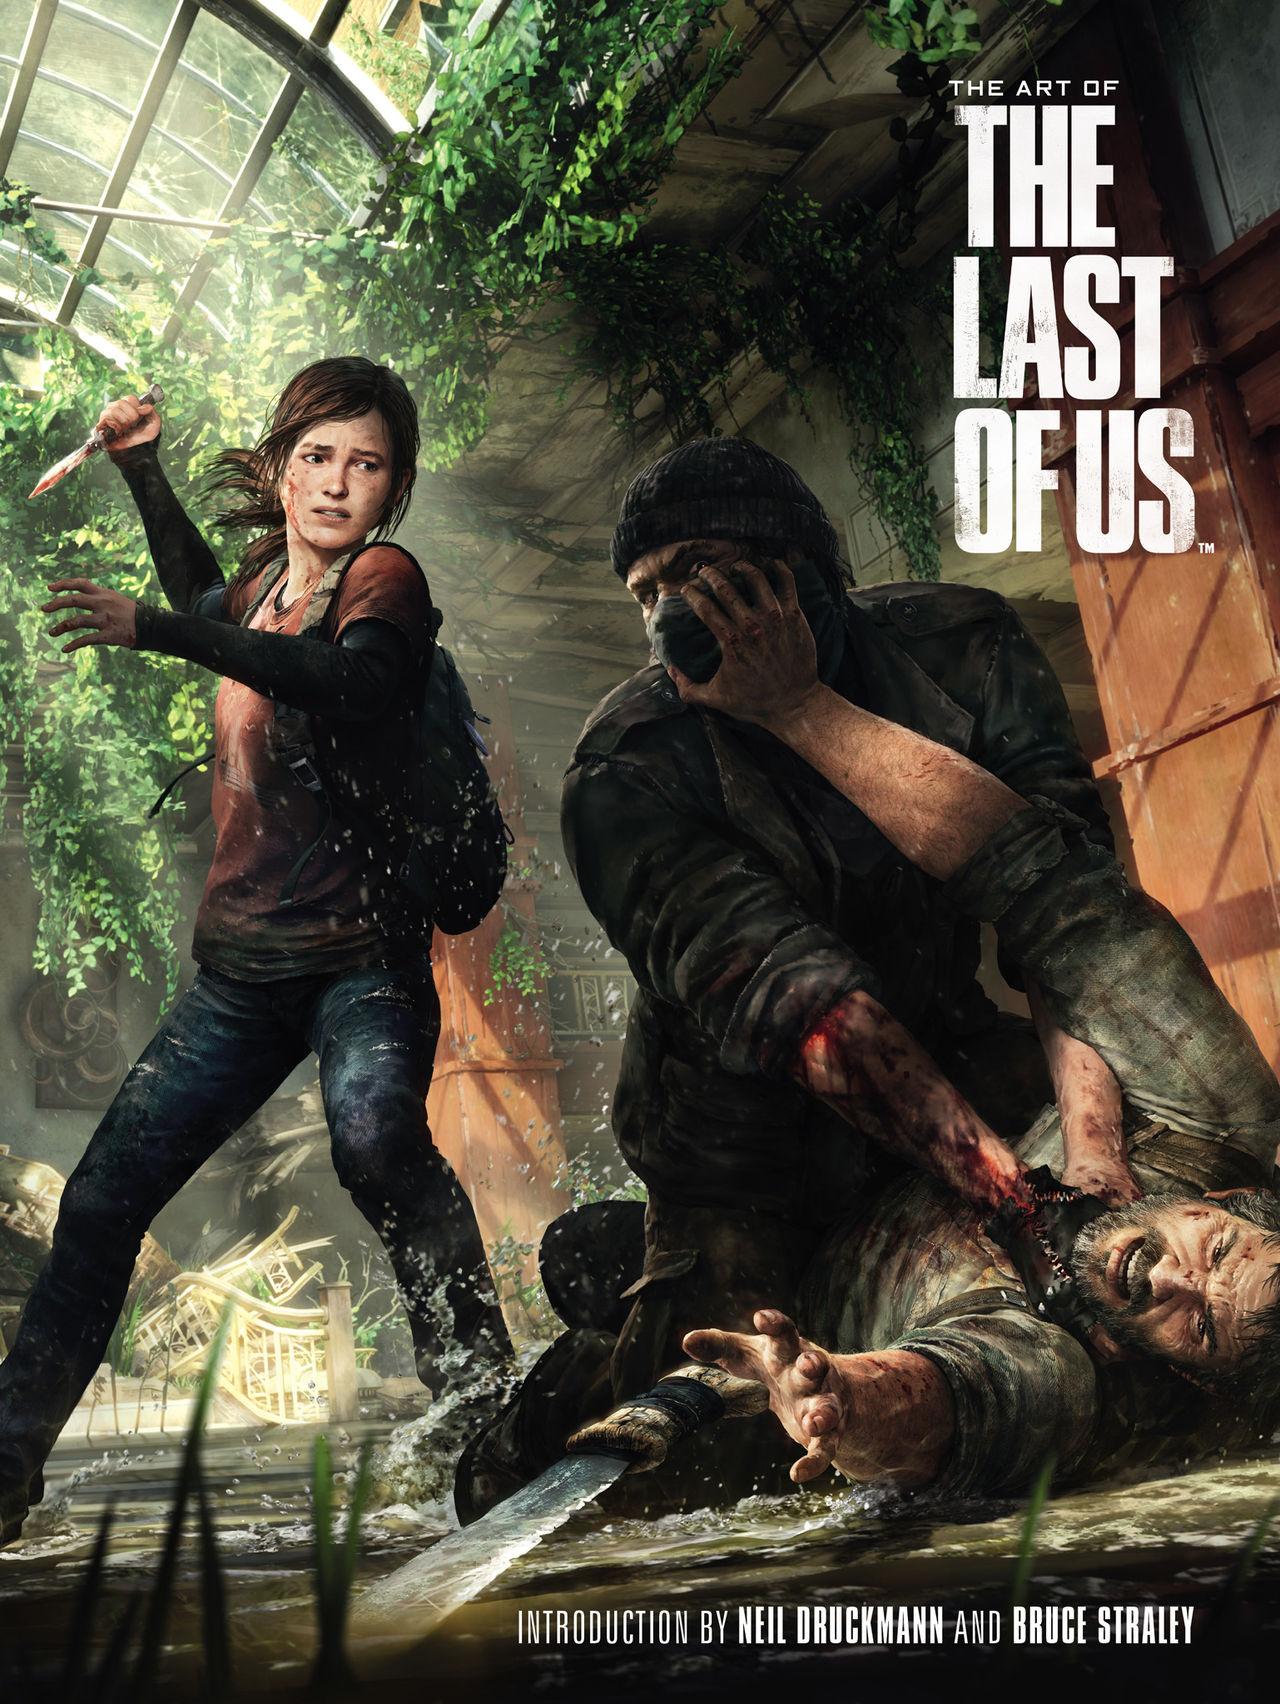 The Art of The Last of Us (2013) (Digital)